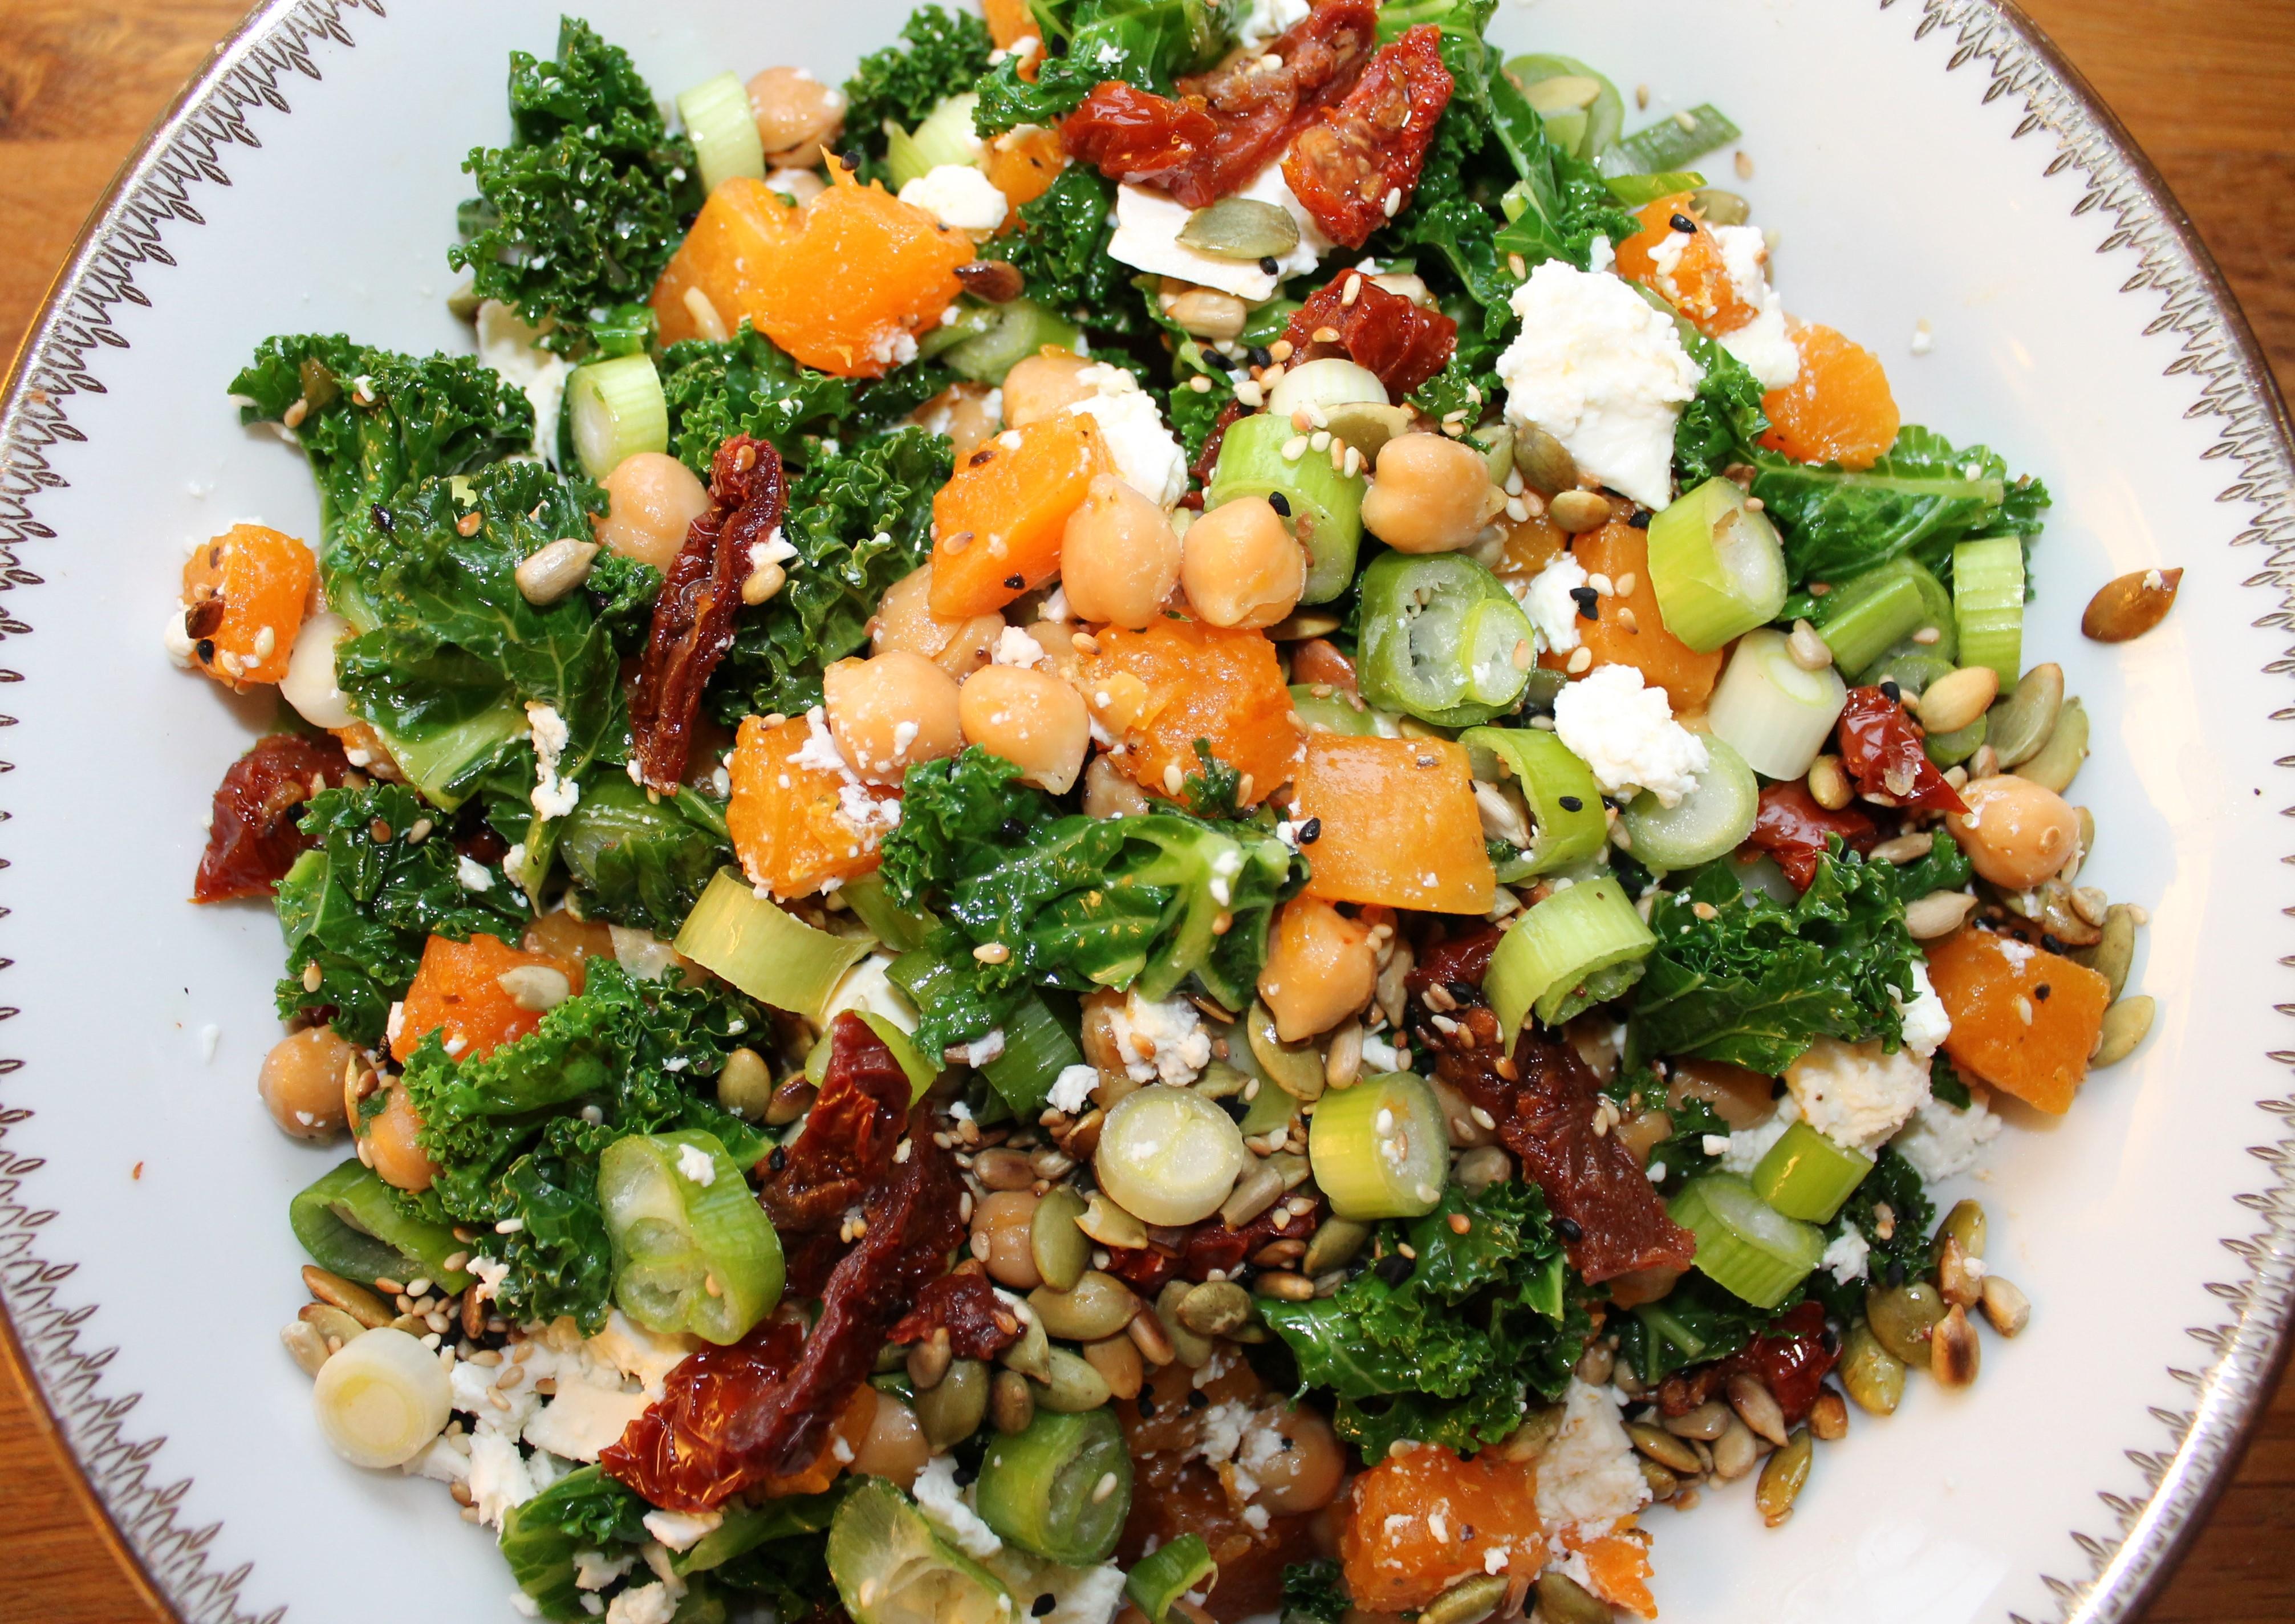 Lun Grønnkål Gresskar Og Kikert Salat Snikgjest